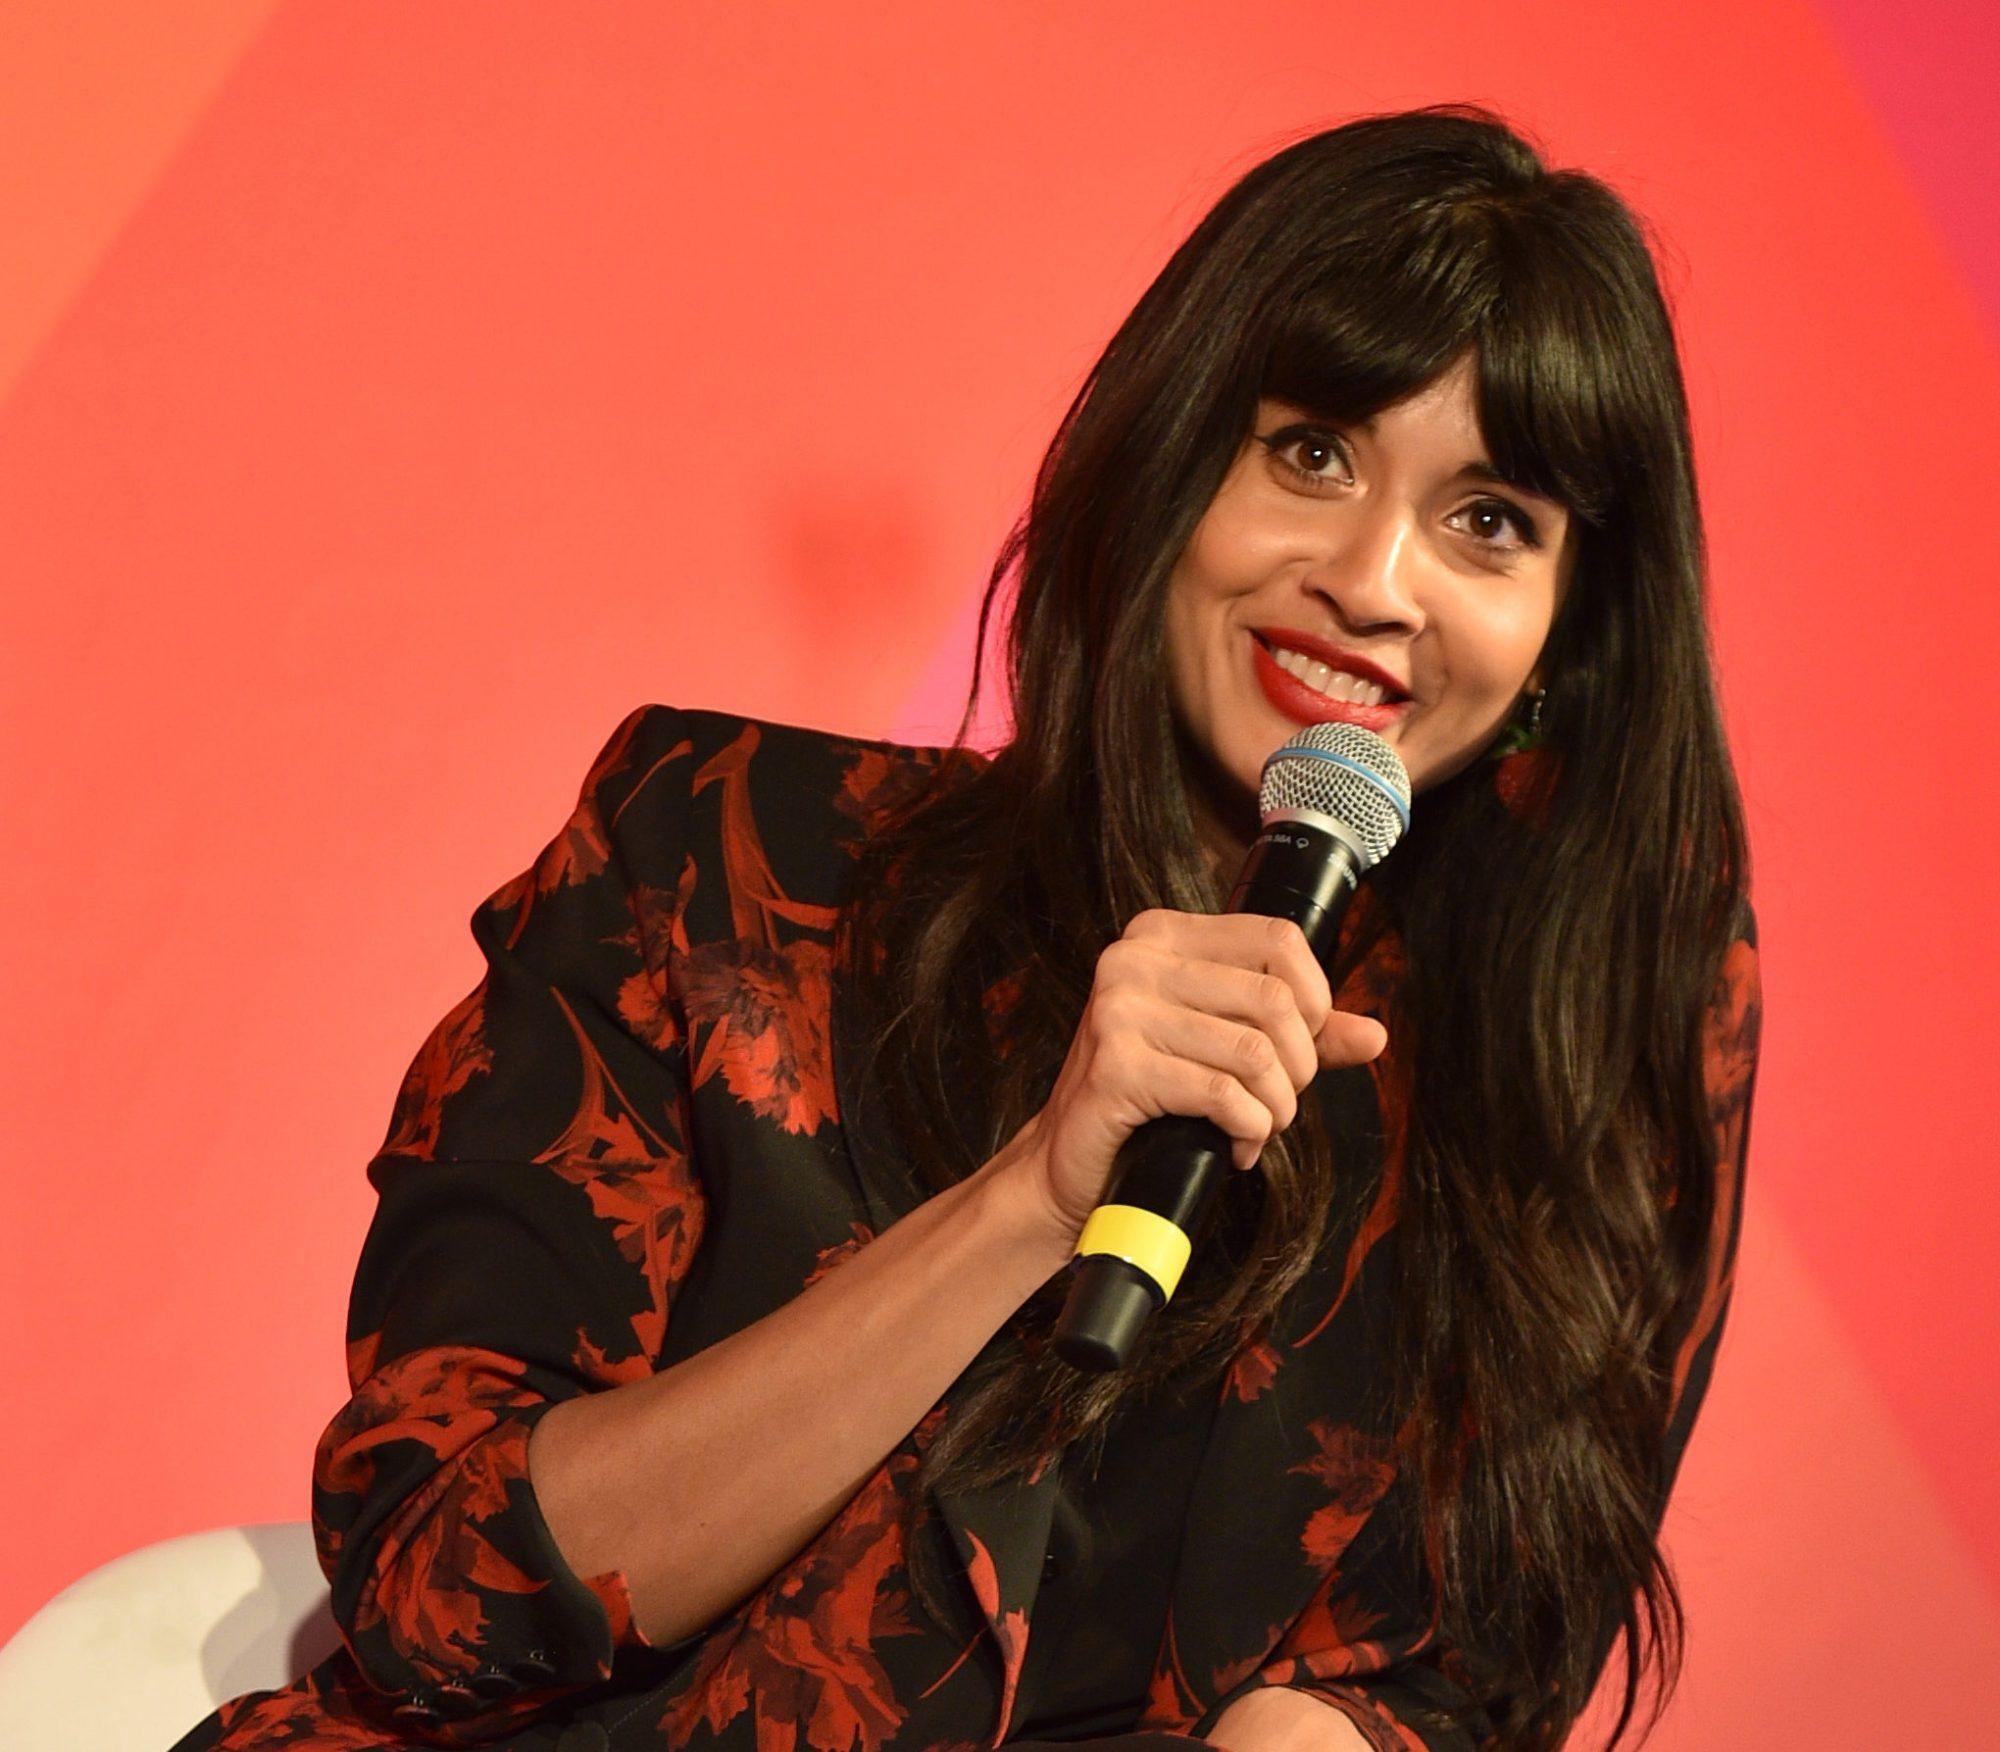 jameela jamil explains the meaning of feminist-in-progress